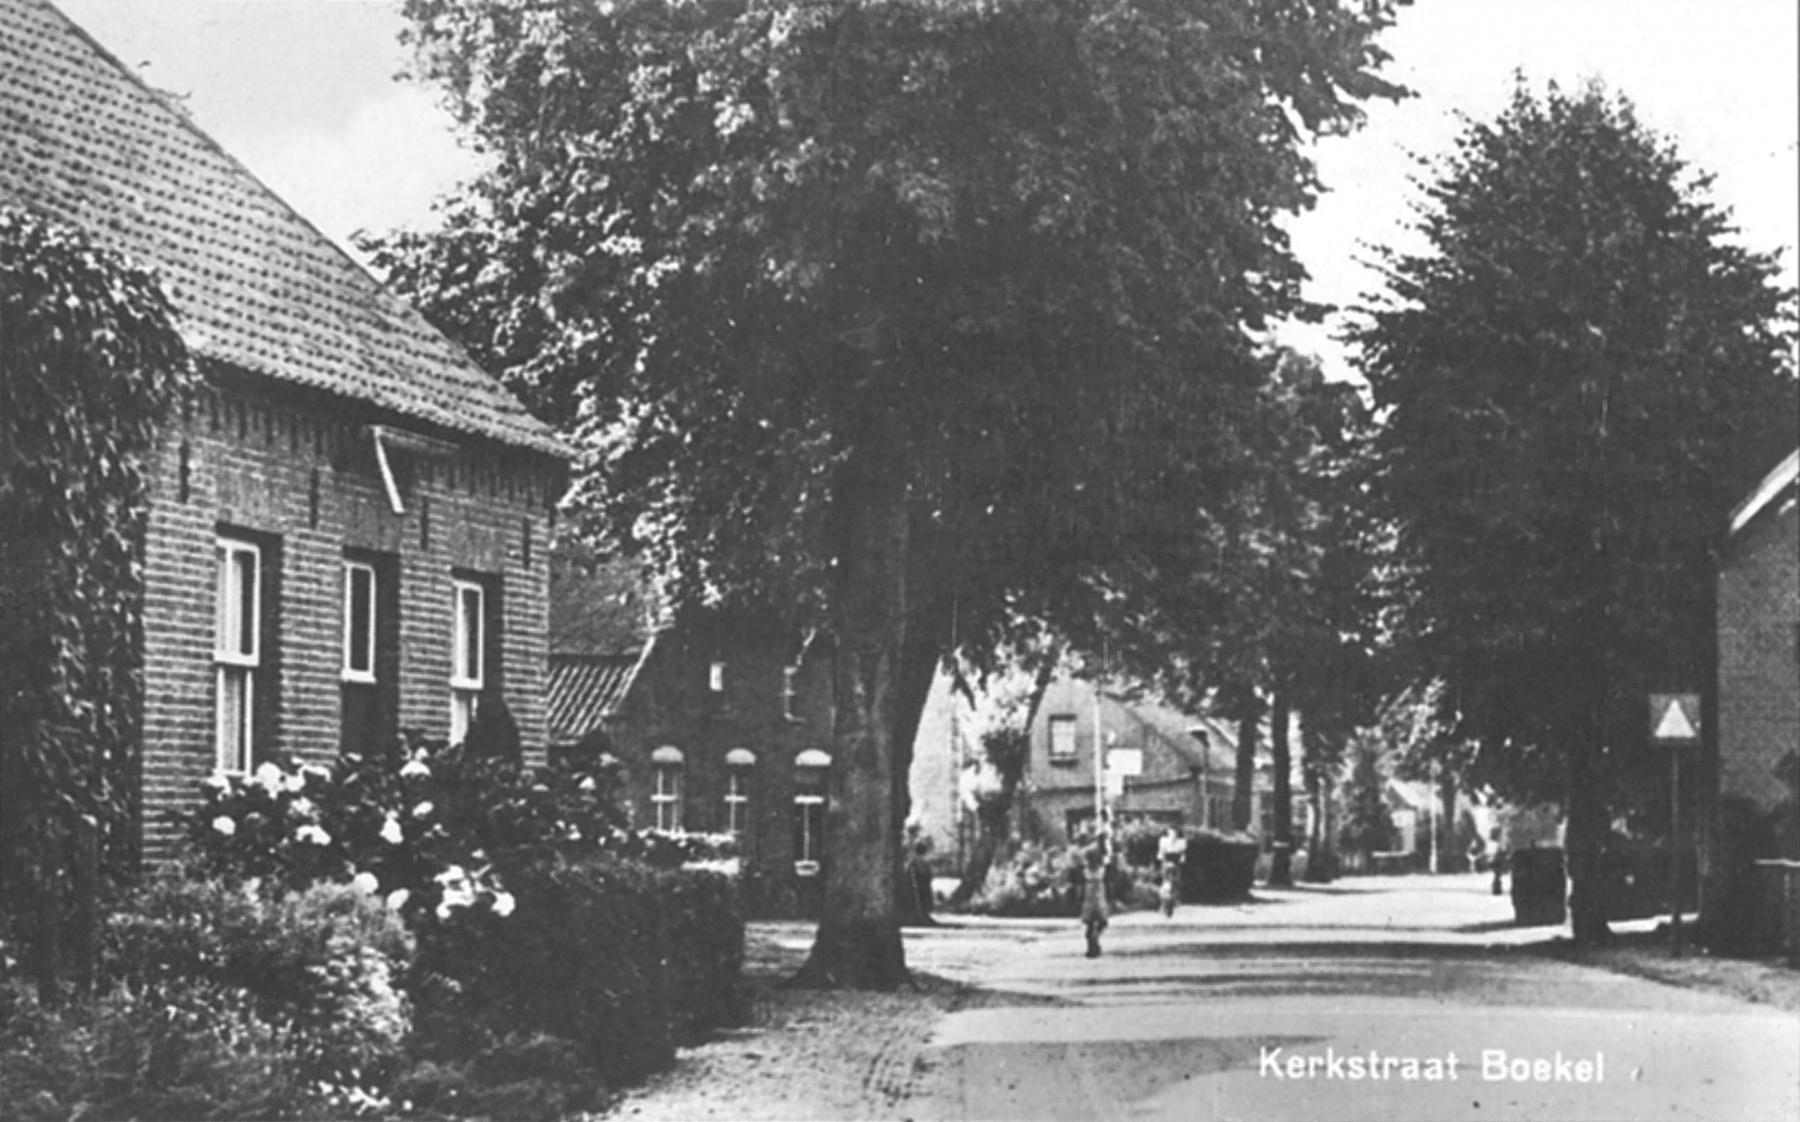 Datering 1948. Kerkstraat